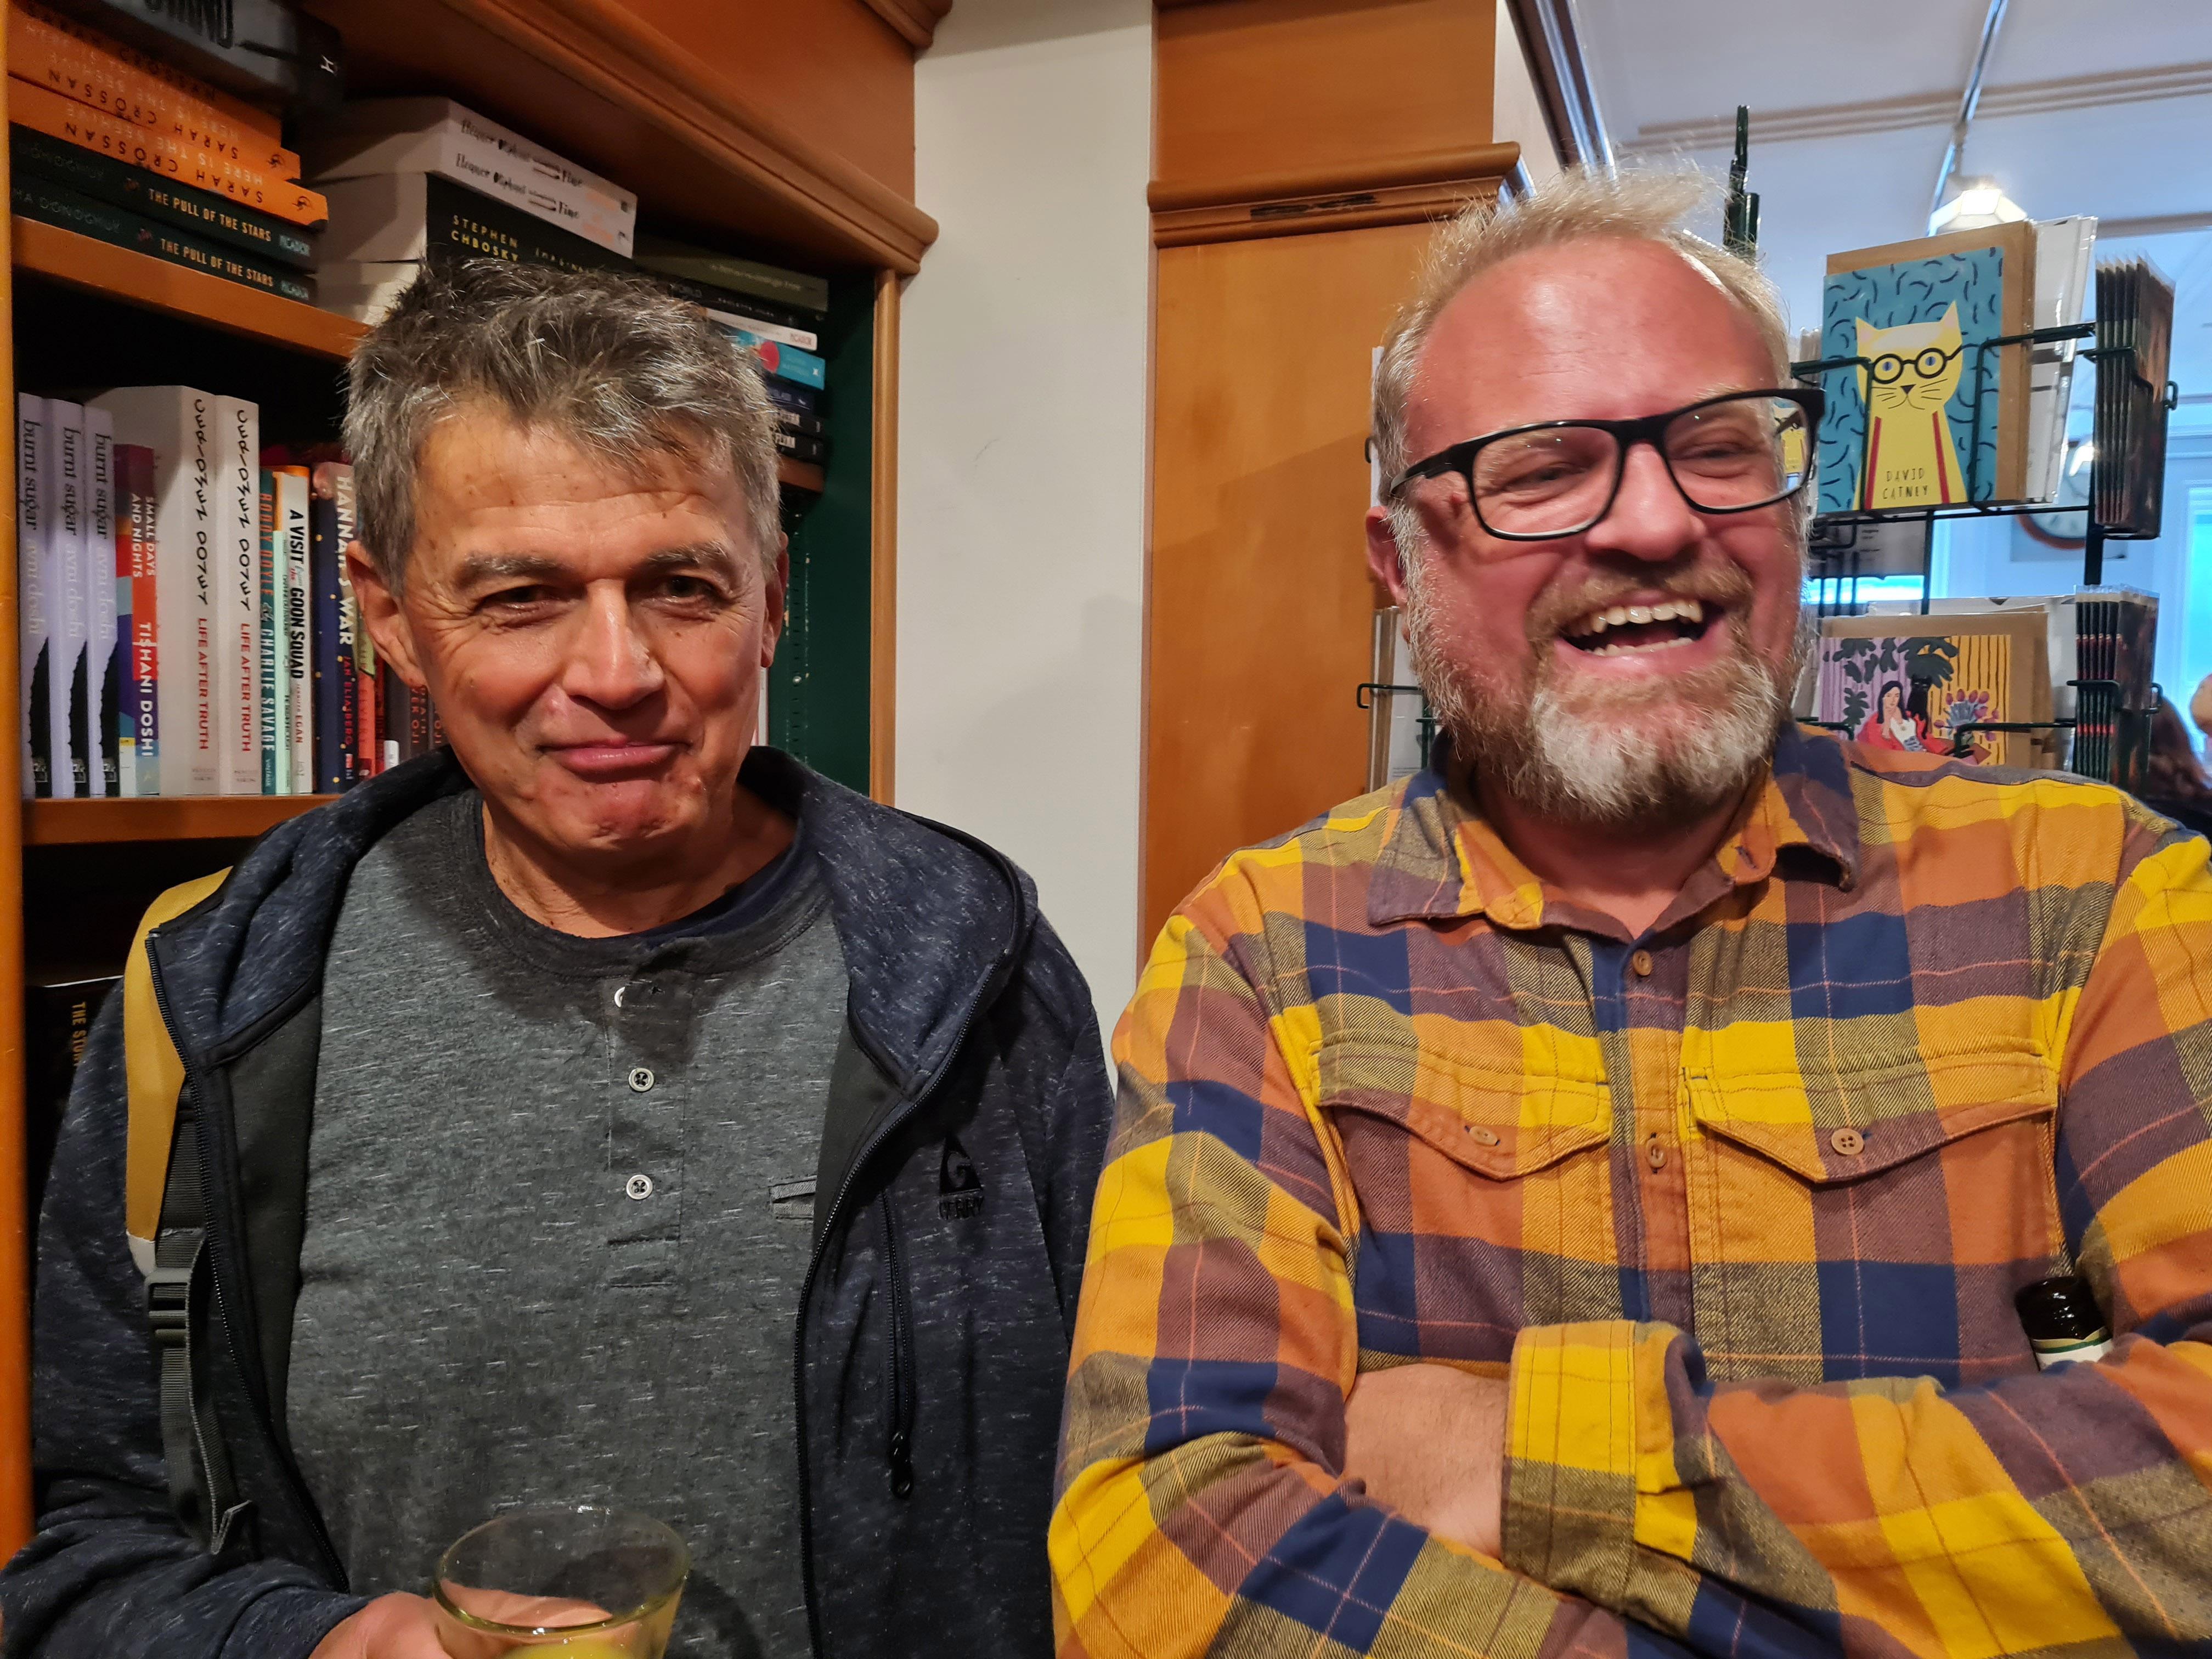 New Zealand poet laureate David Eggleton and some guy